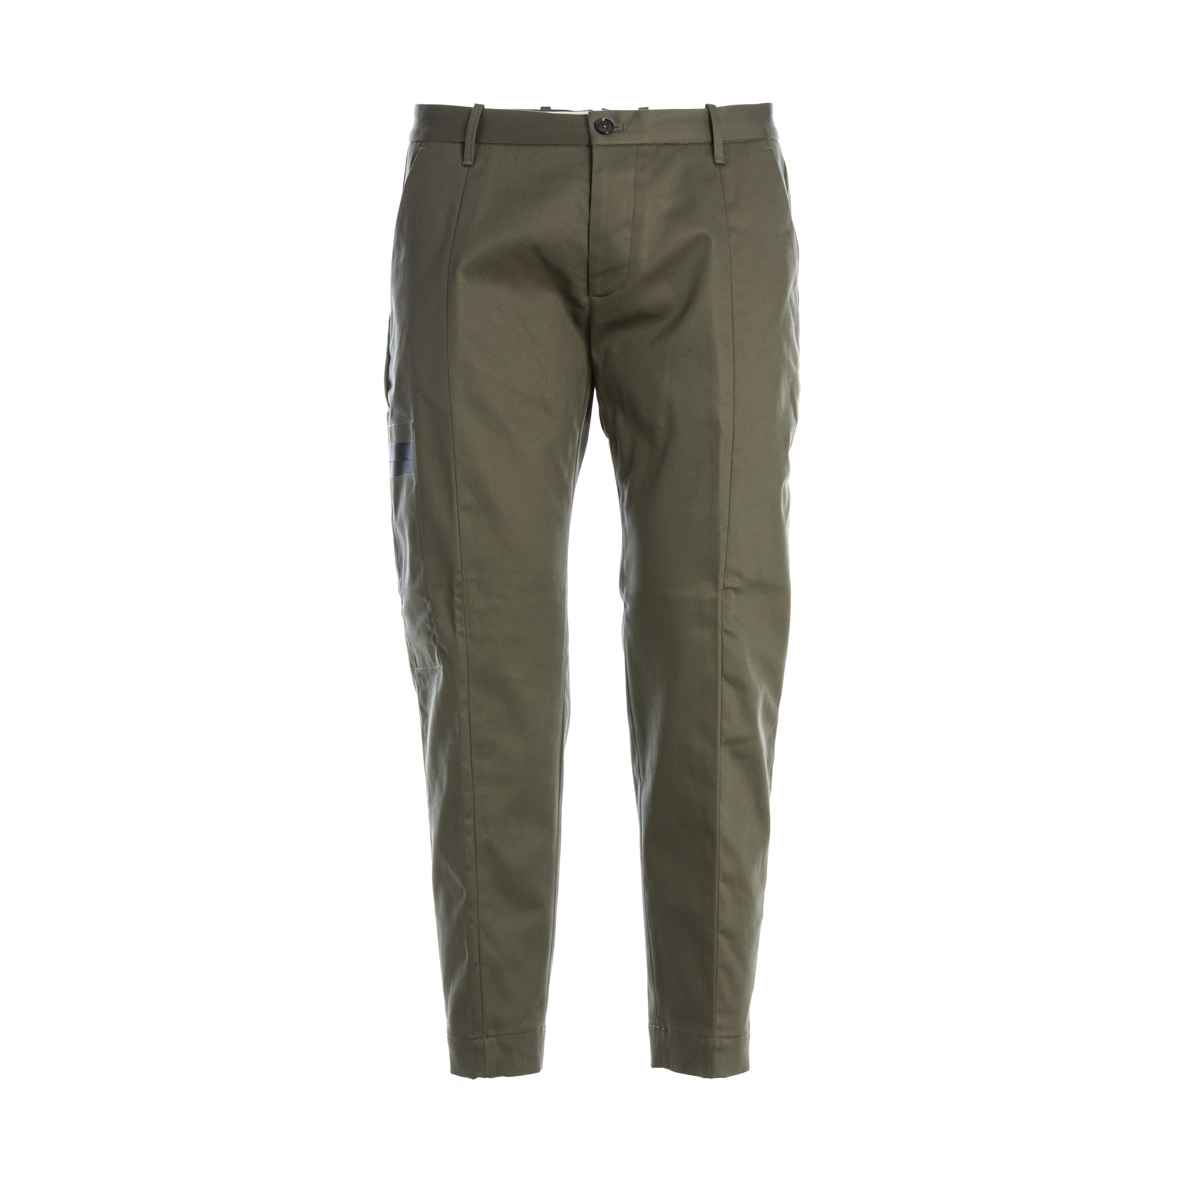 Pantalone Cargo Nine in the Morning Verde militare modello Carrot